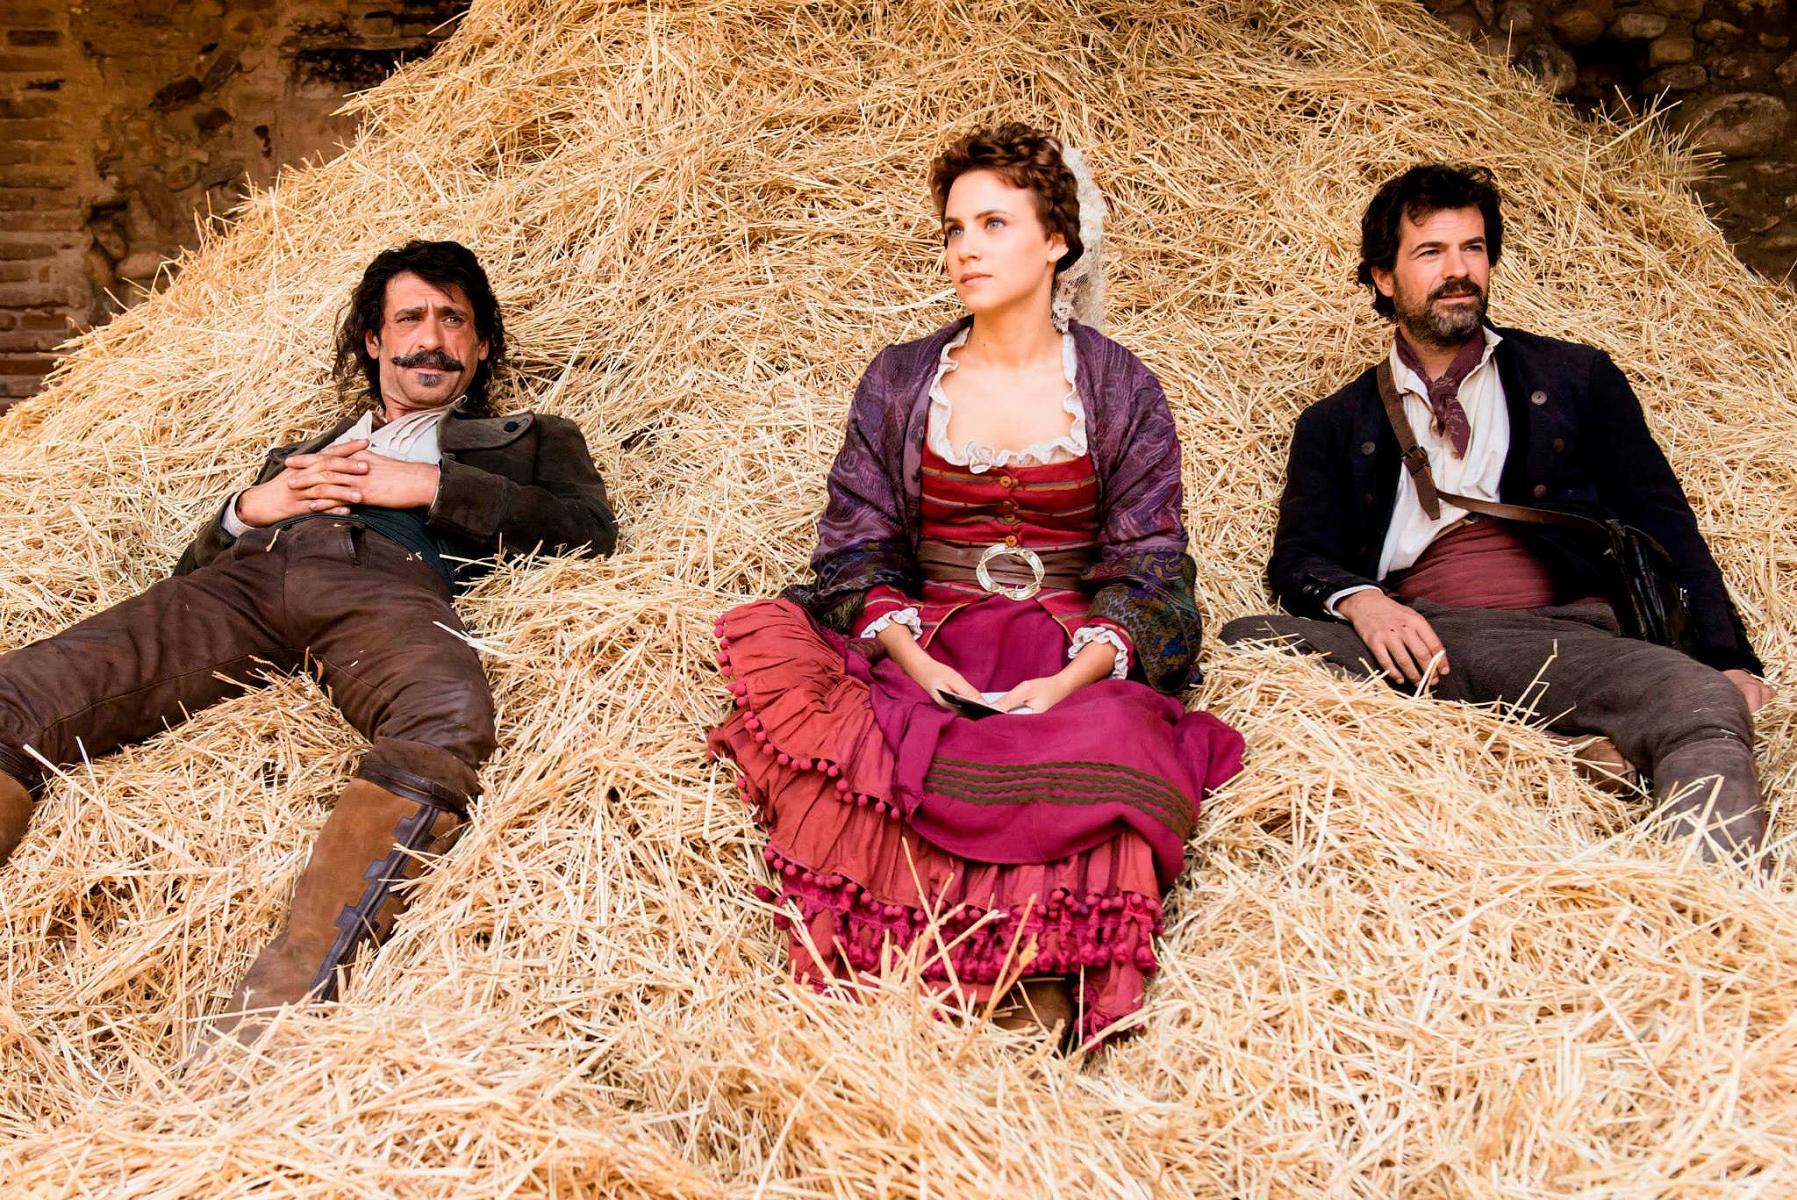 Alonso, Amelia y Julián